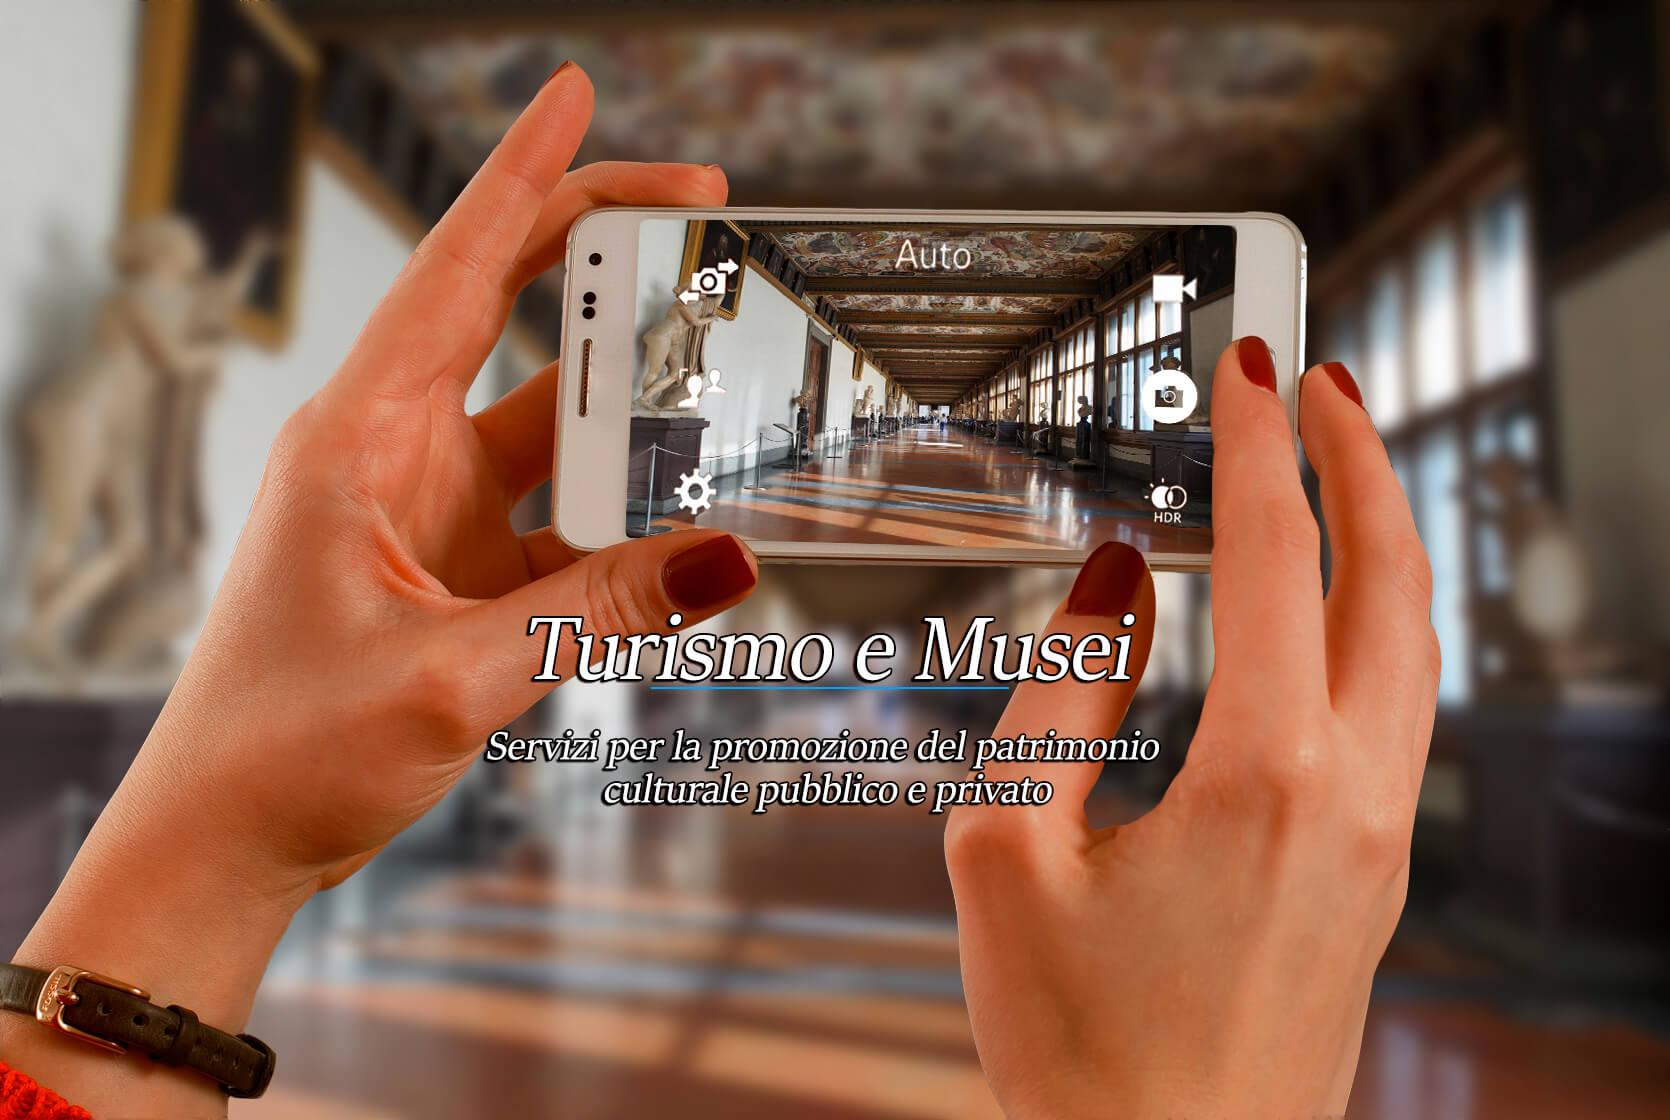 CS_Turismo-e-Musei